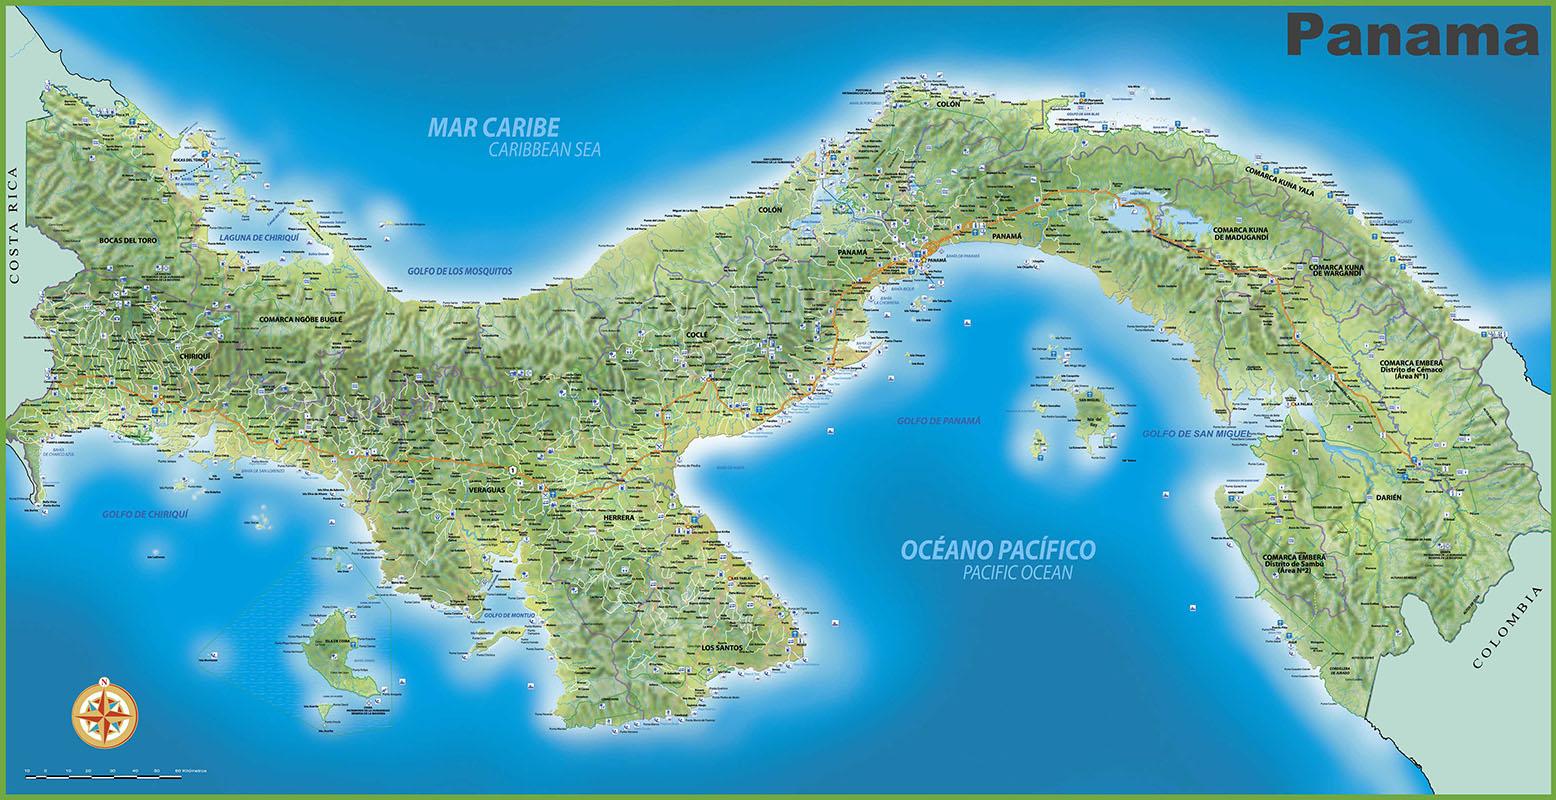 Detailed map of Panama